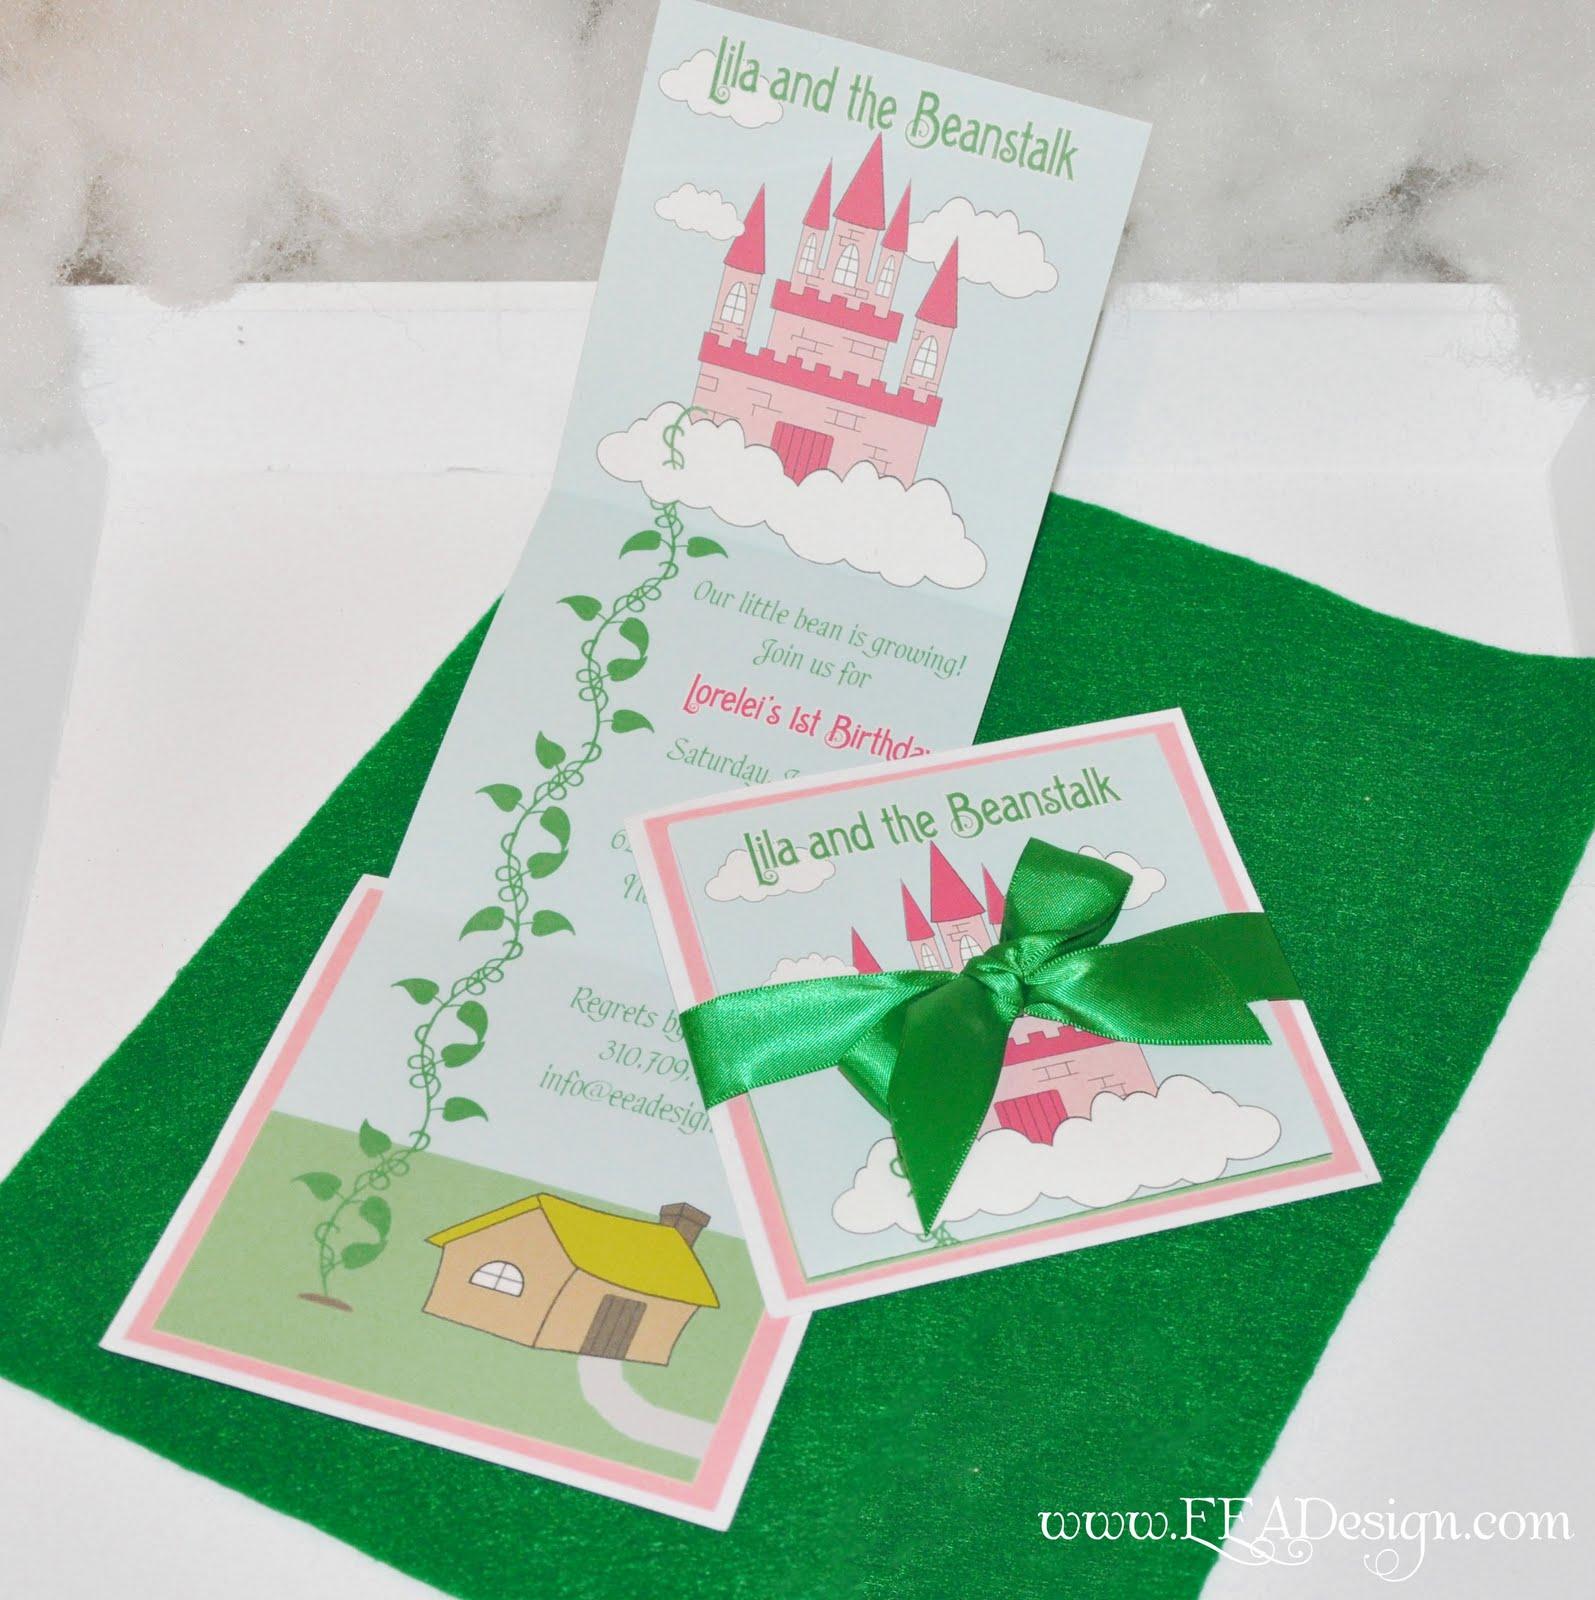 Enchanted Events Amp Design Event Recap Lila Amp The Beanstalk 1st Birthday